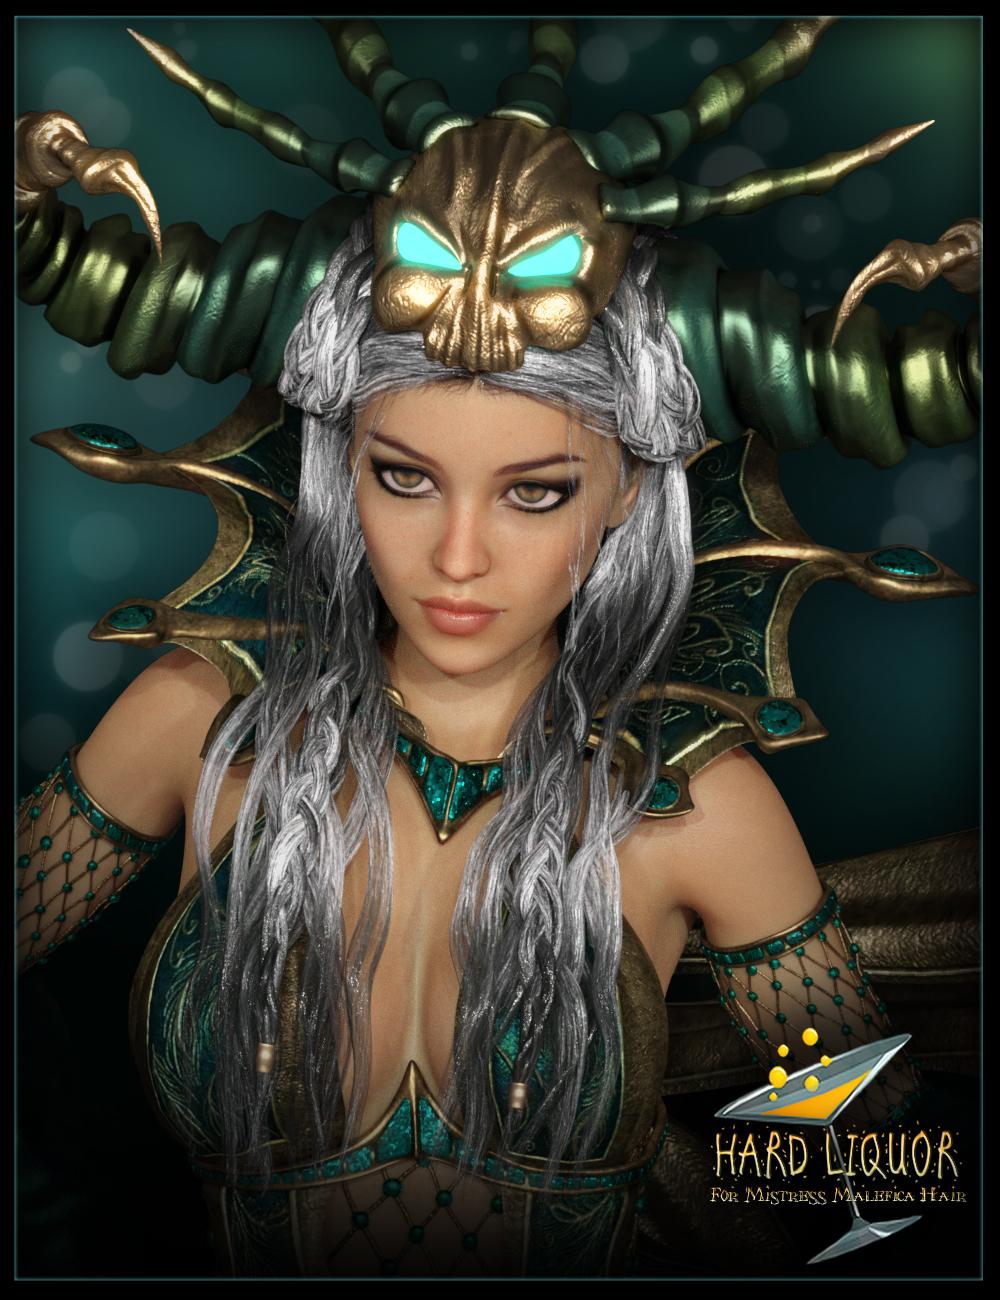 Hard Liquor for Mistress Malefica Hair by: IgnisSerpentus, 3D Models by Daz 3D